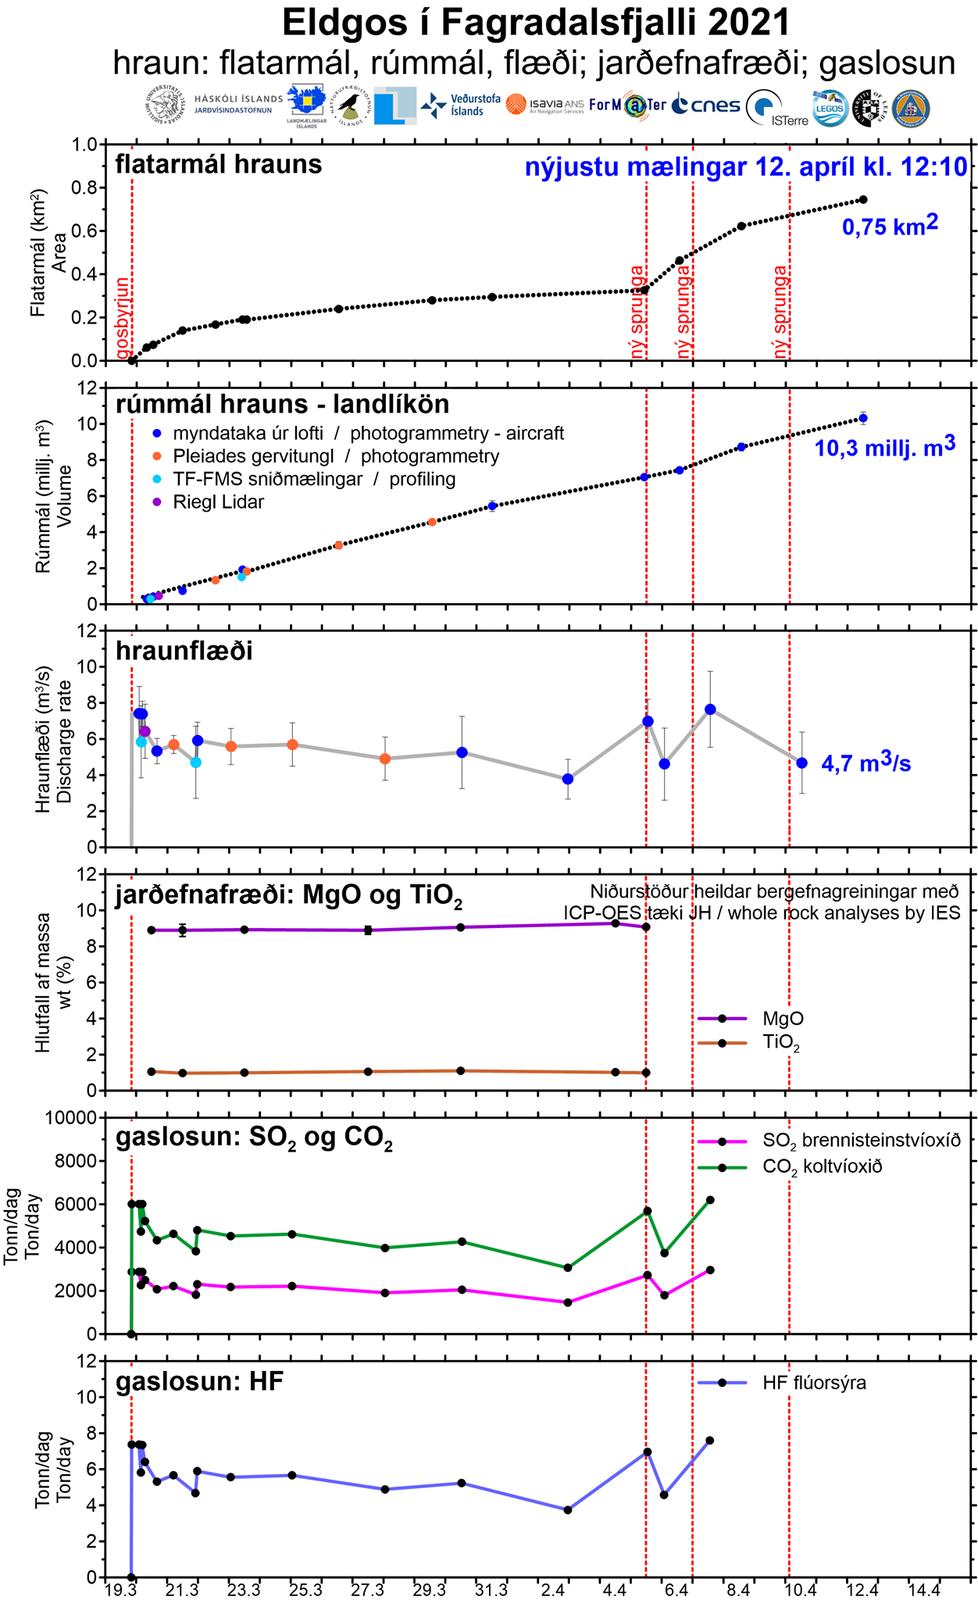 Eruption à Fagradalsjfall - paramètres au 12.04.2021 - Doc. Jarðvísindastofnun Háskólans